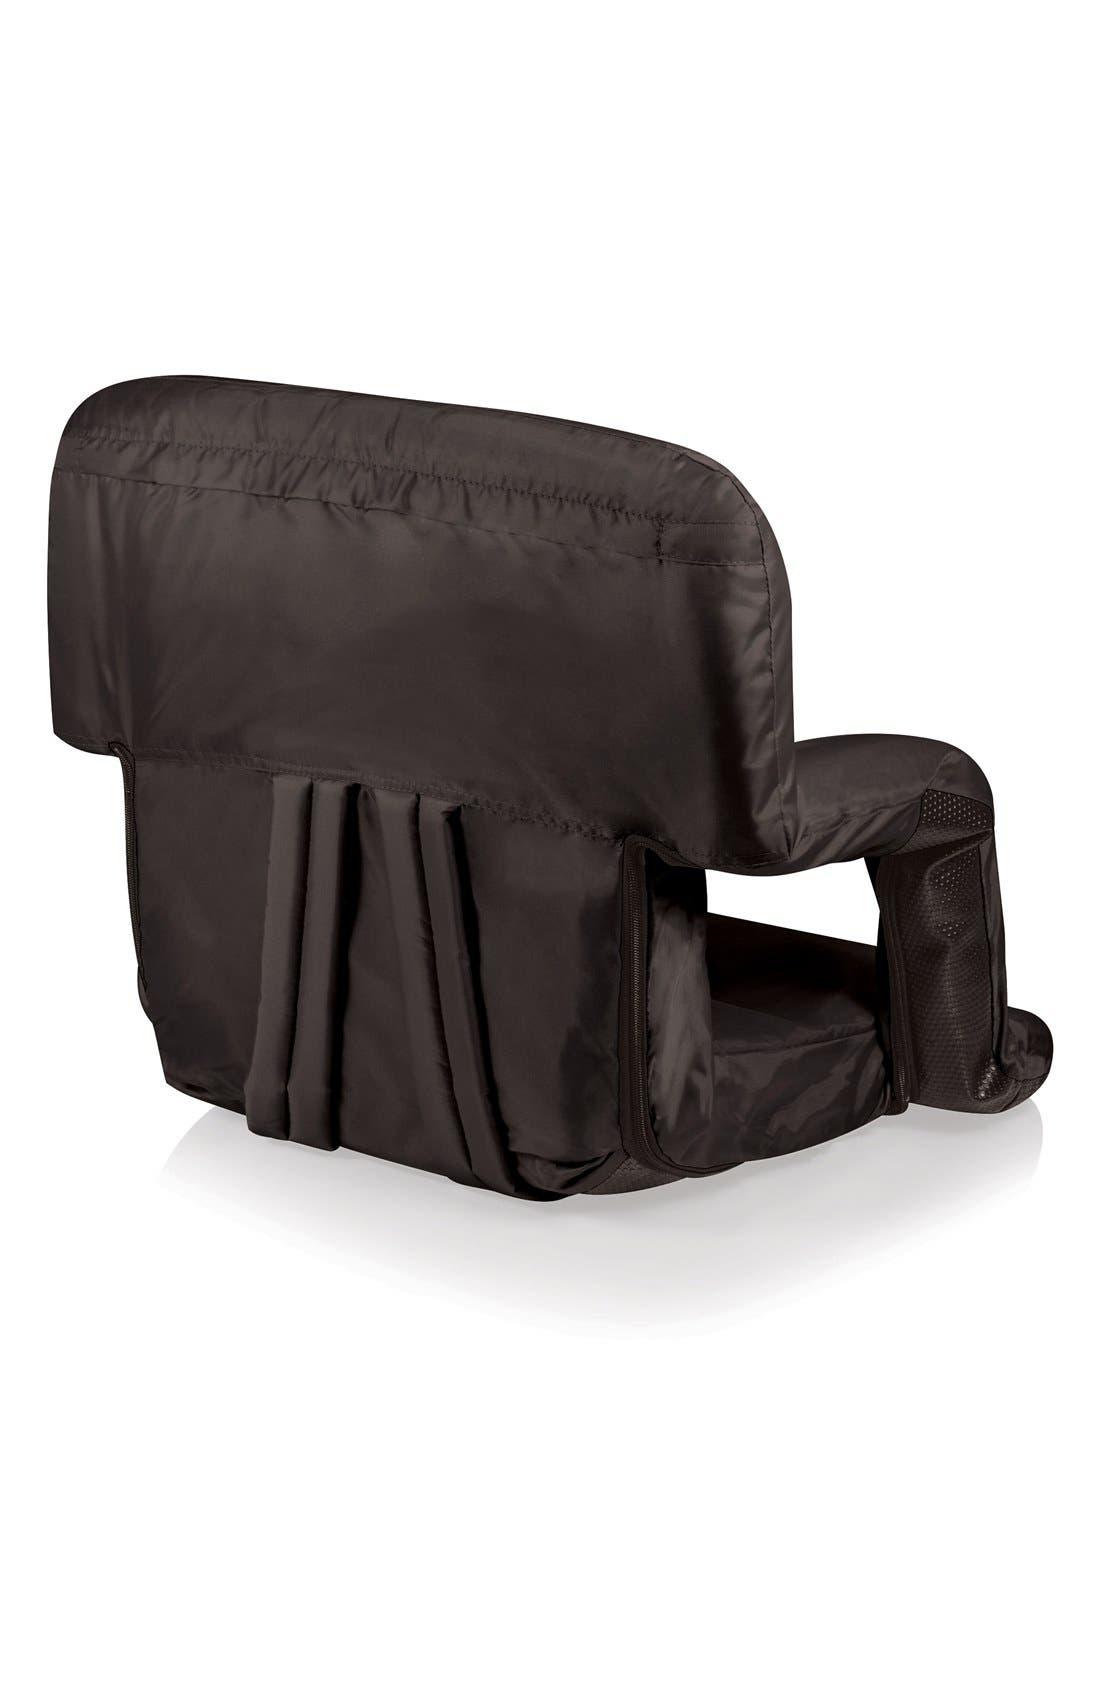 'VenturaSeat' Portable Fold-Up Chair,                             Alternate thumbnail 2, color,                             BLACK